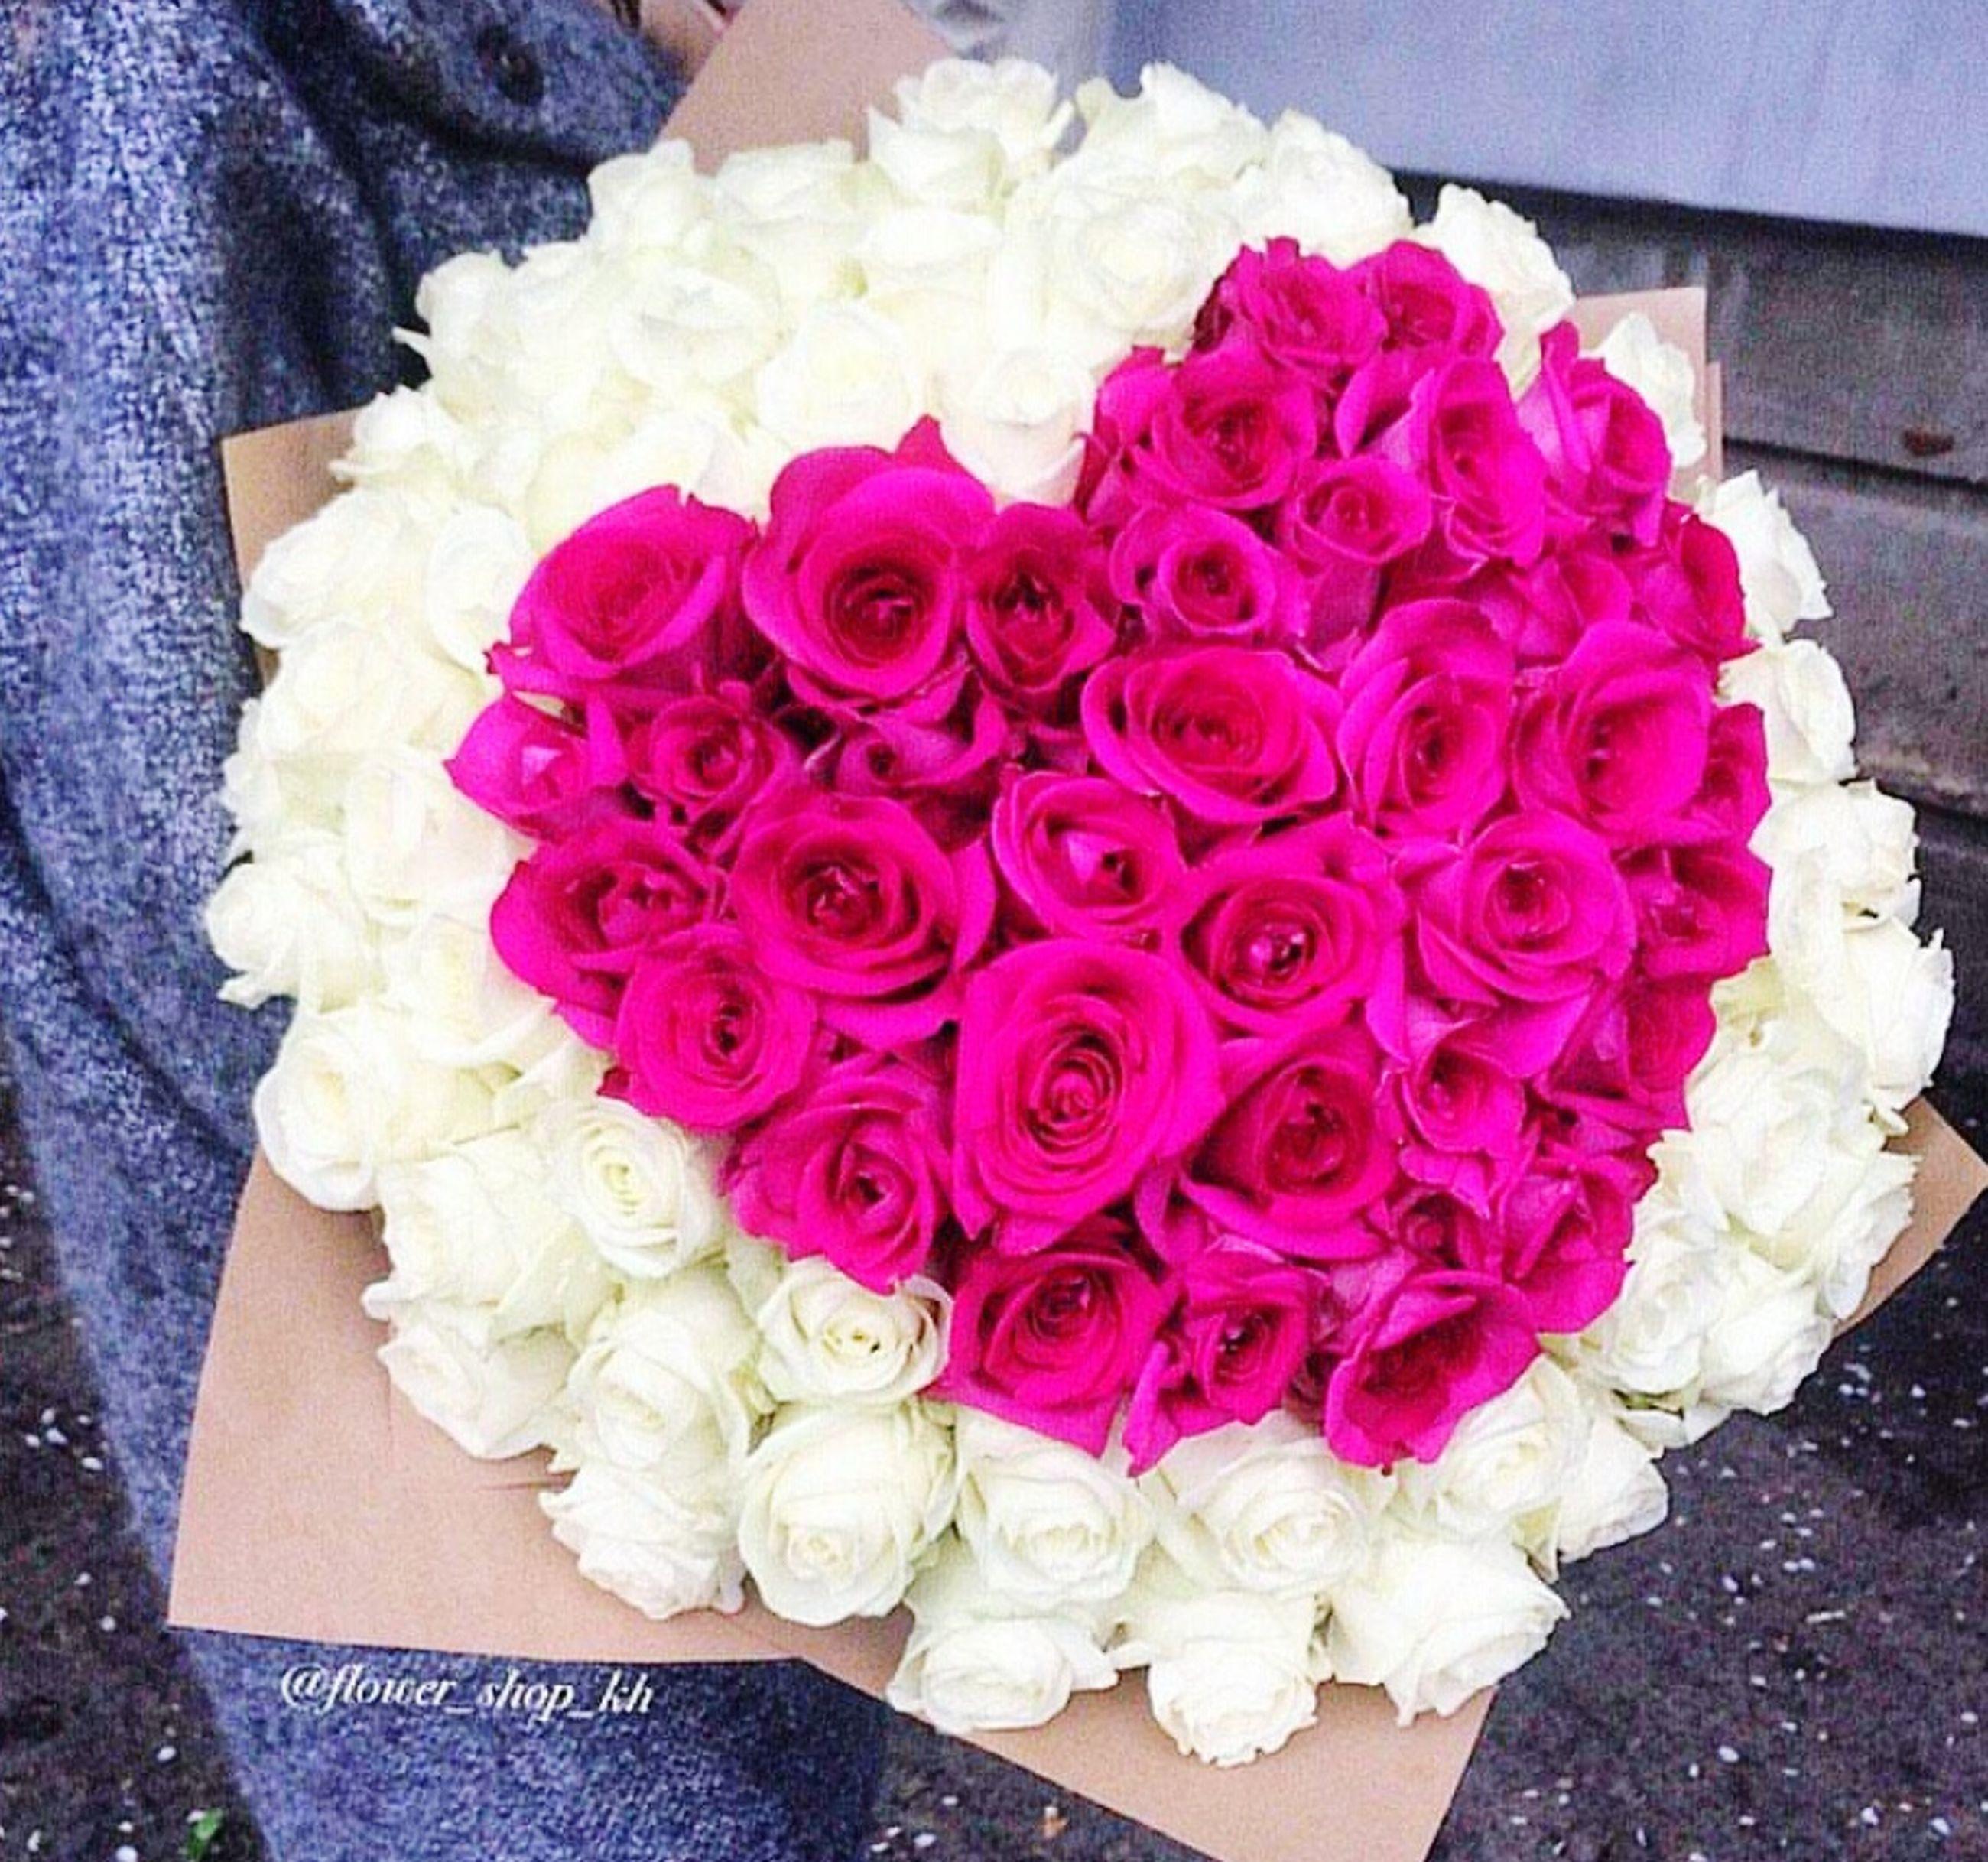 flower, freshness, indoors, petal, flower head, fragility, bouquet, rose - flower, high angle view, multi colored, variation, bunch of flowers, vase, flower arrangement, beauty in nature, pink color, decoration, table, arrangement, close-up